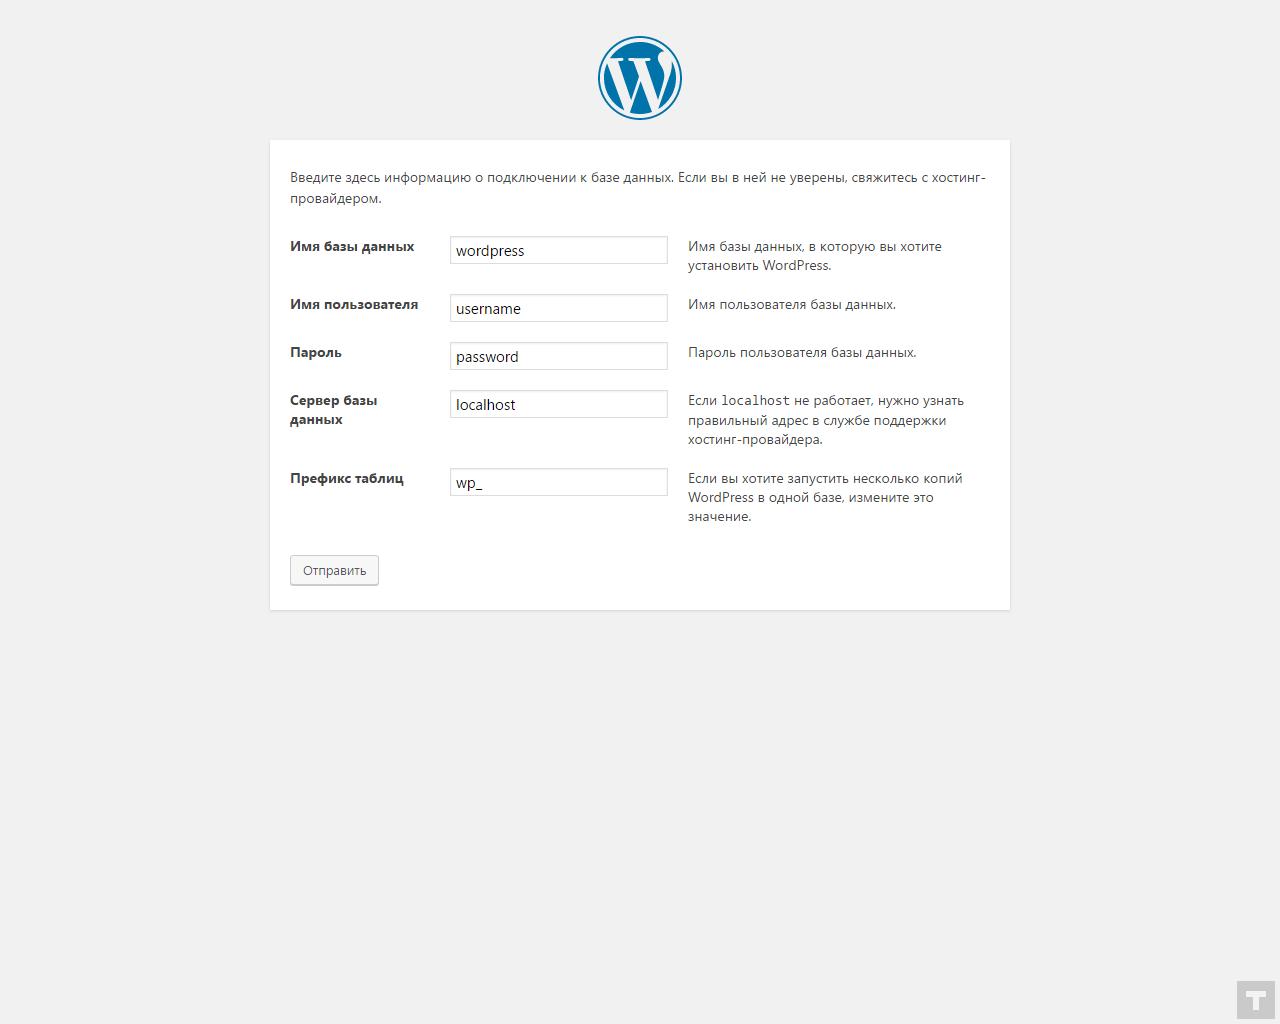 Параметры для CMS WordPress